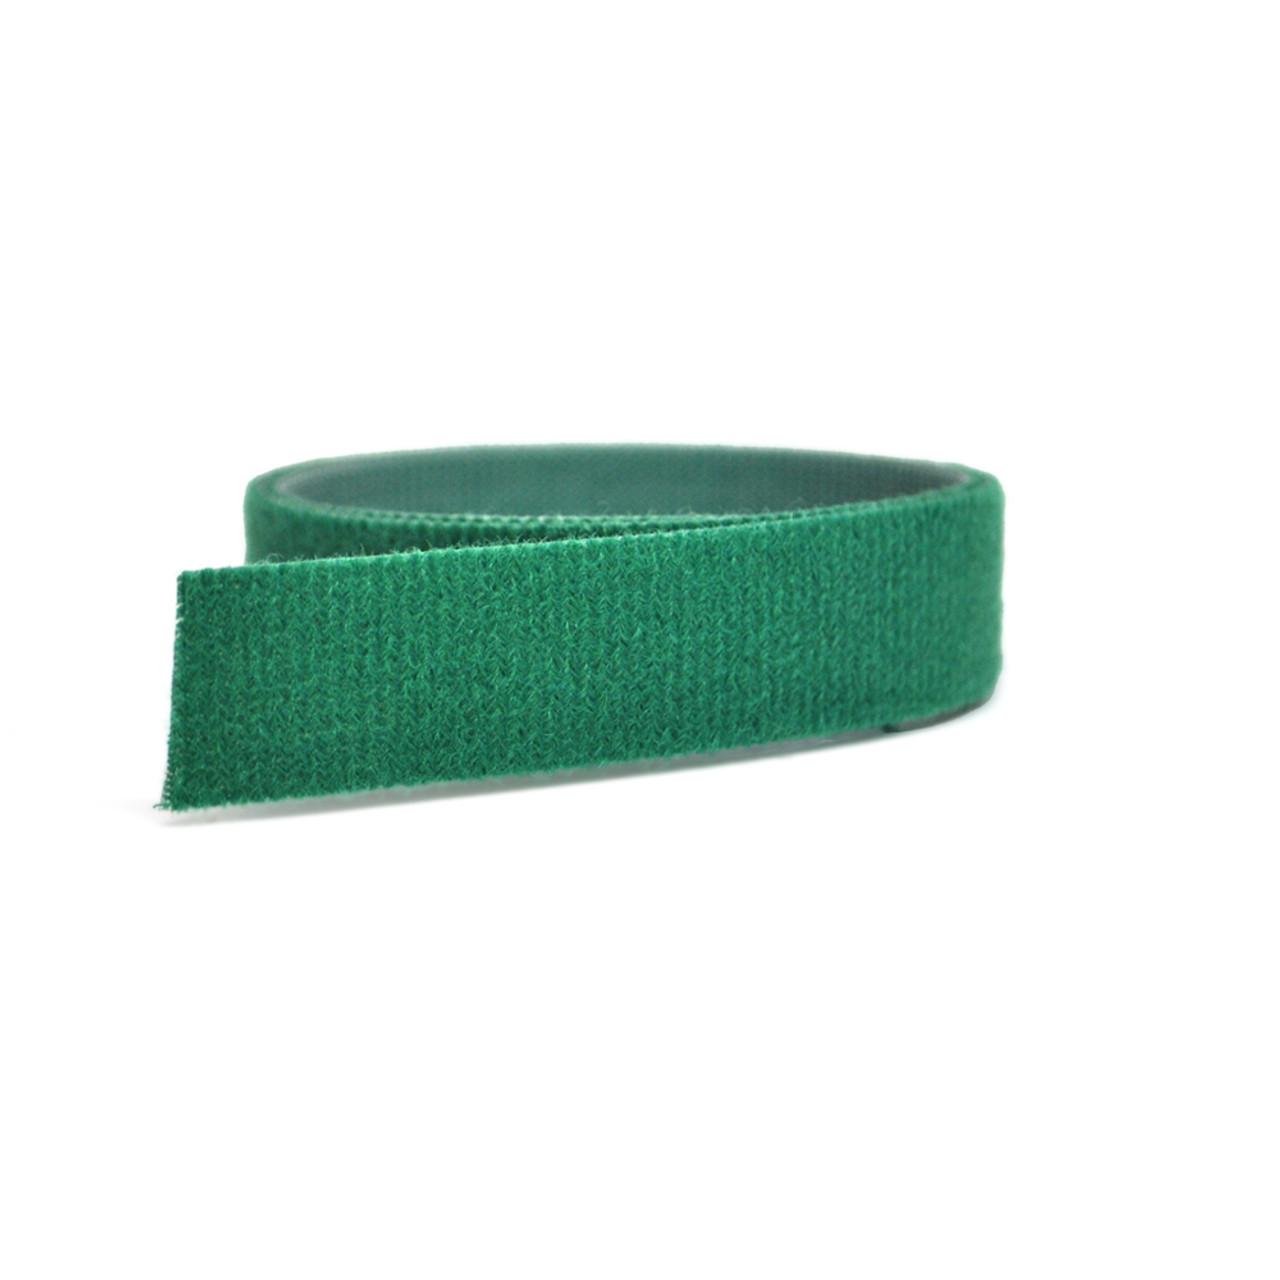 VELCRO® Brand ONE-WRAP® Tape Green Mini Rolls